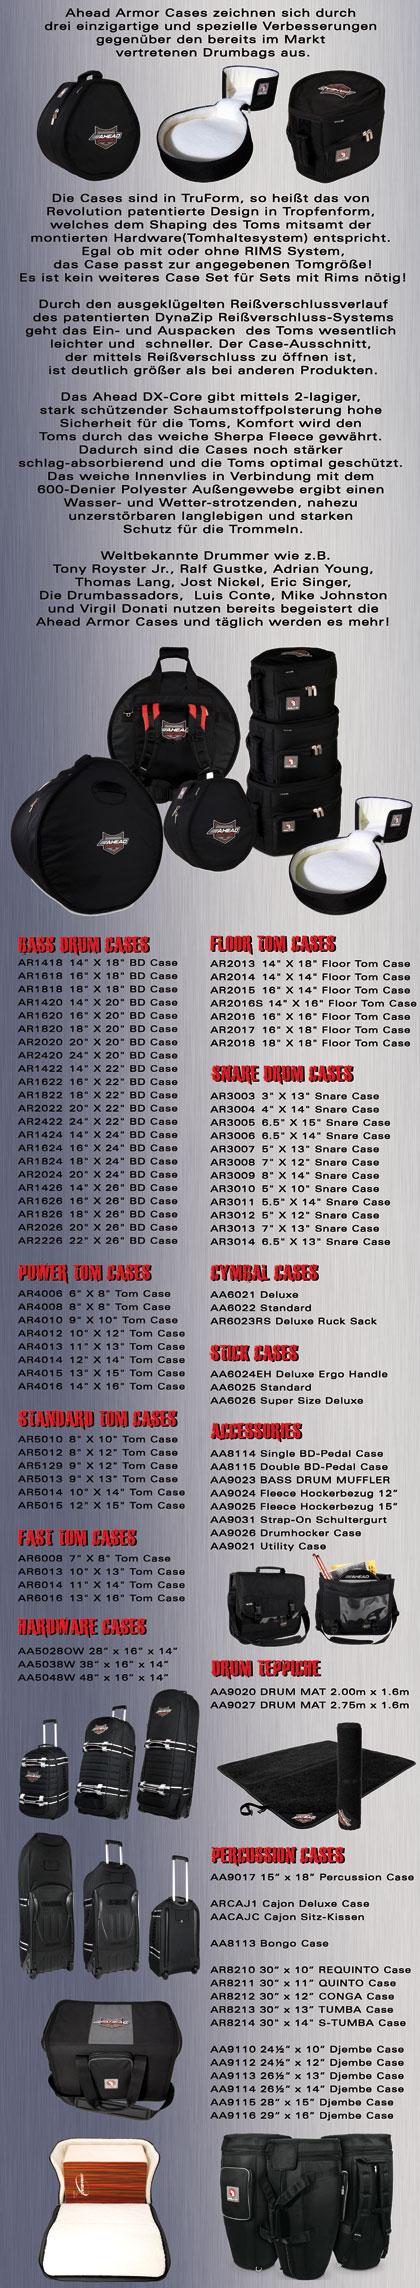 Armor Case bottom